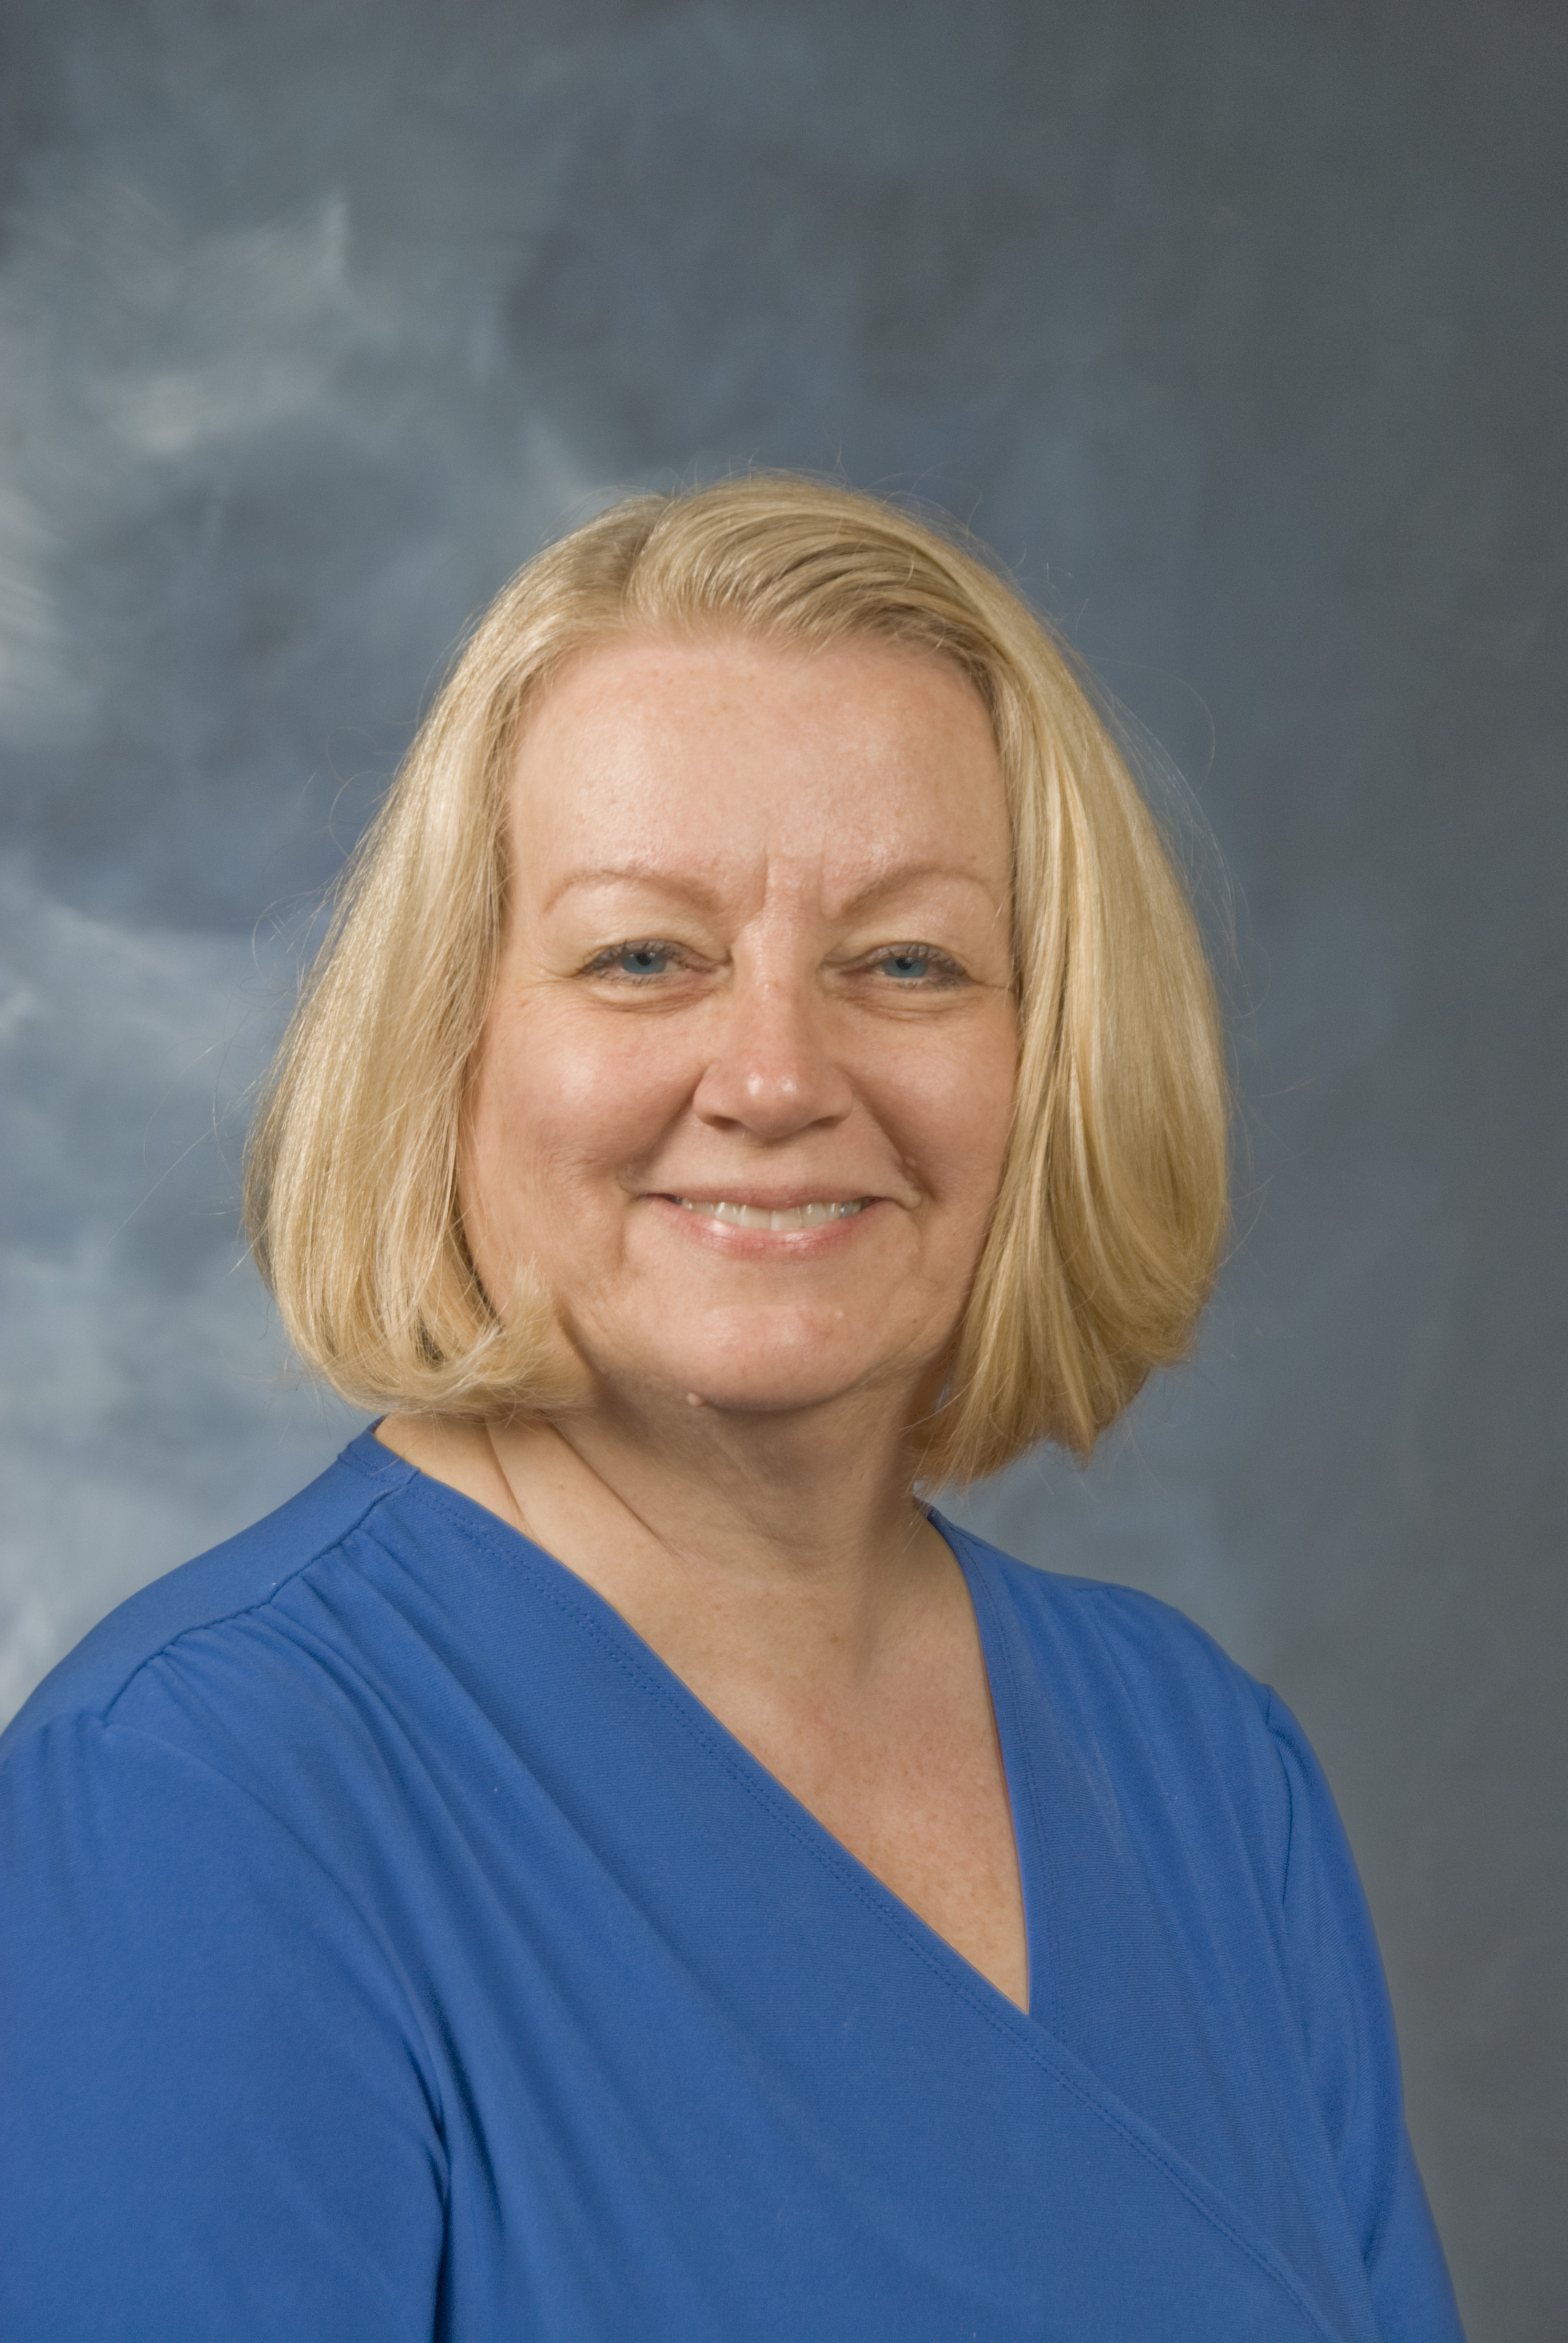 Mary Gerkovich, Ph.D.